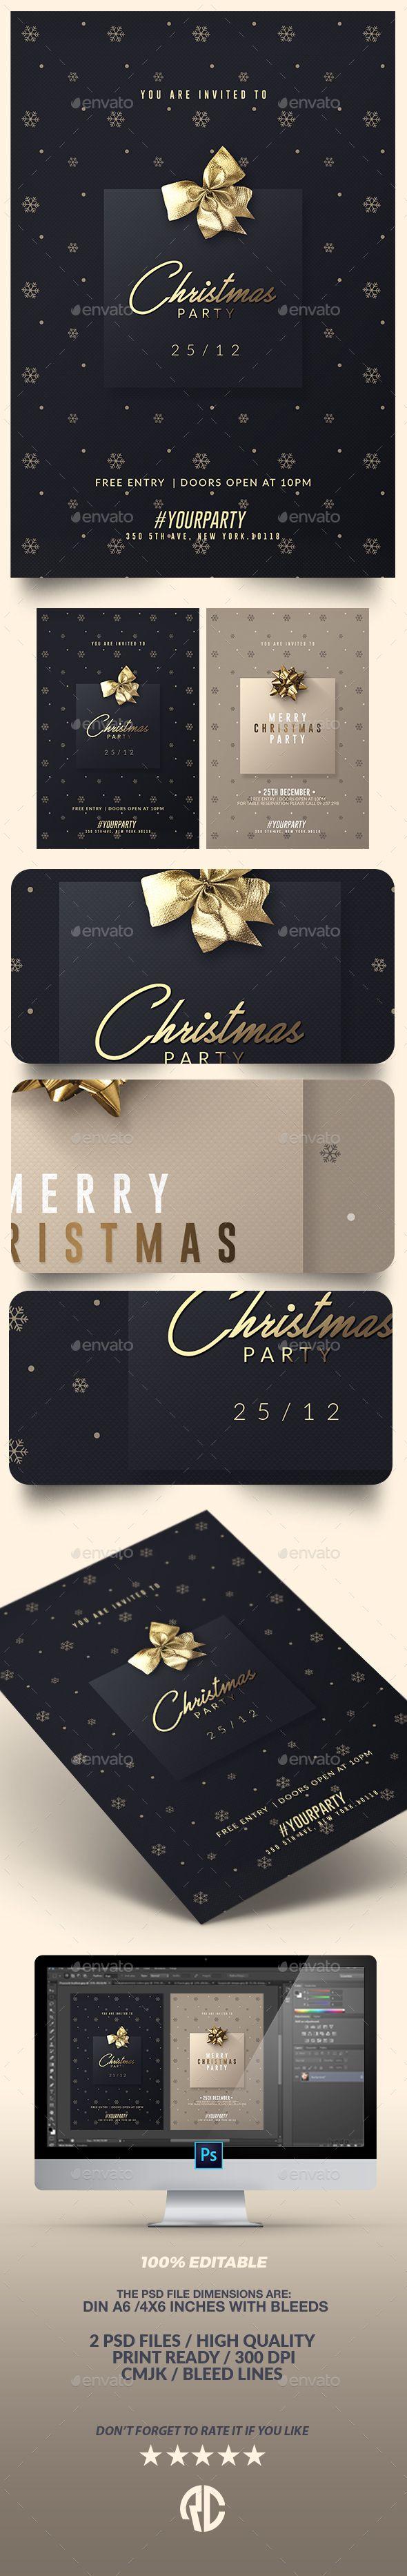 2 Classy Christmas Party | Invitation Templates | Card & Invite ...